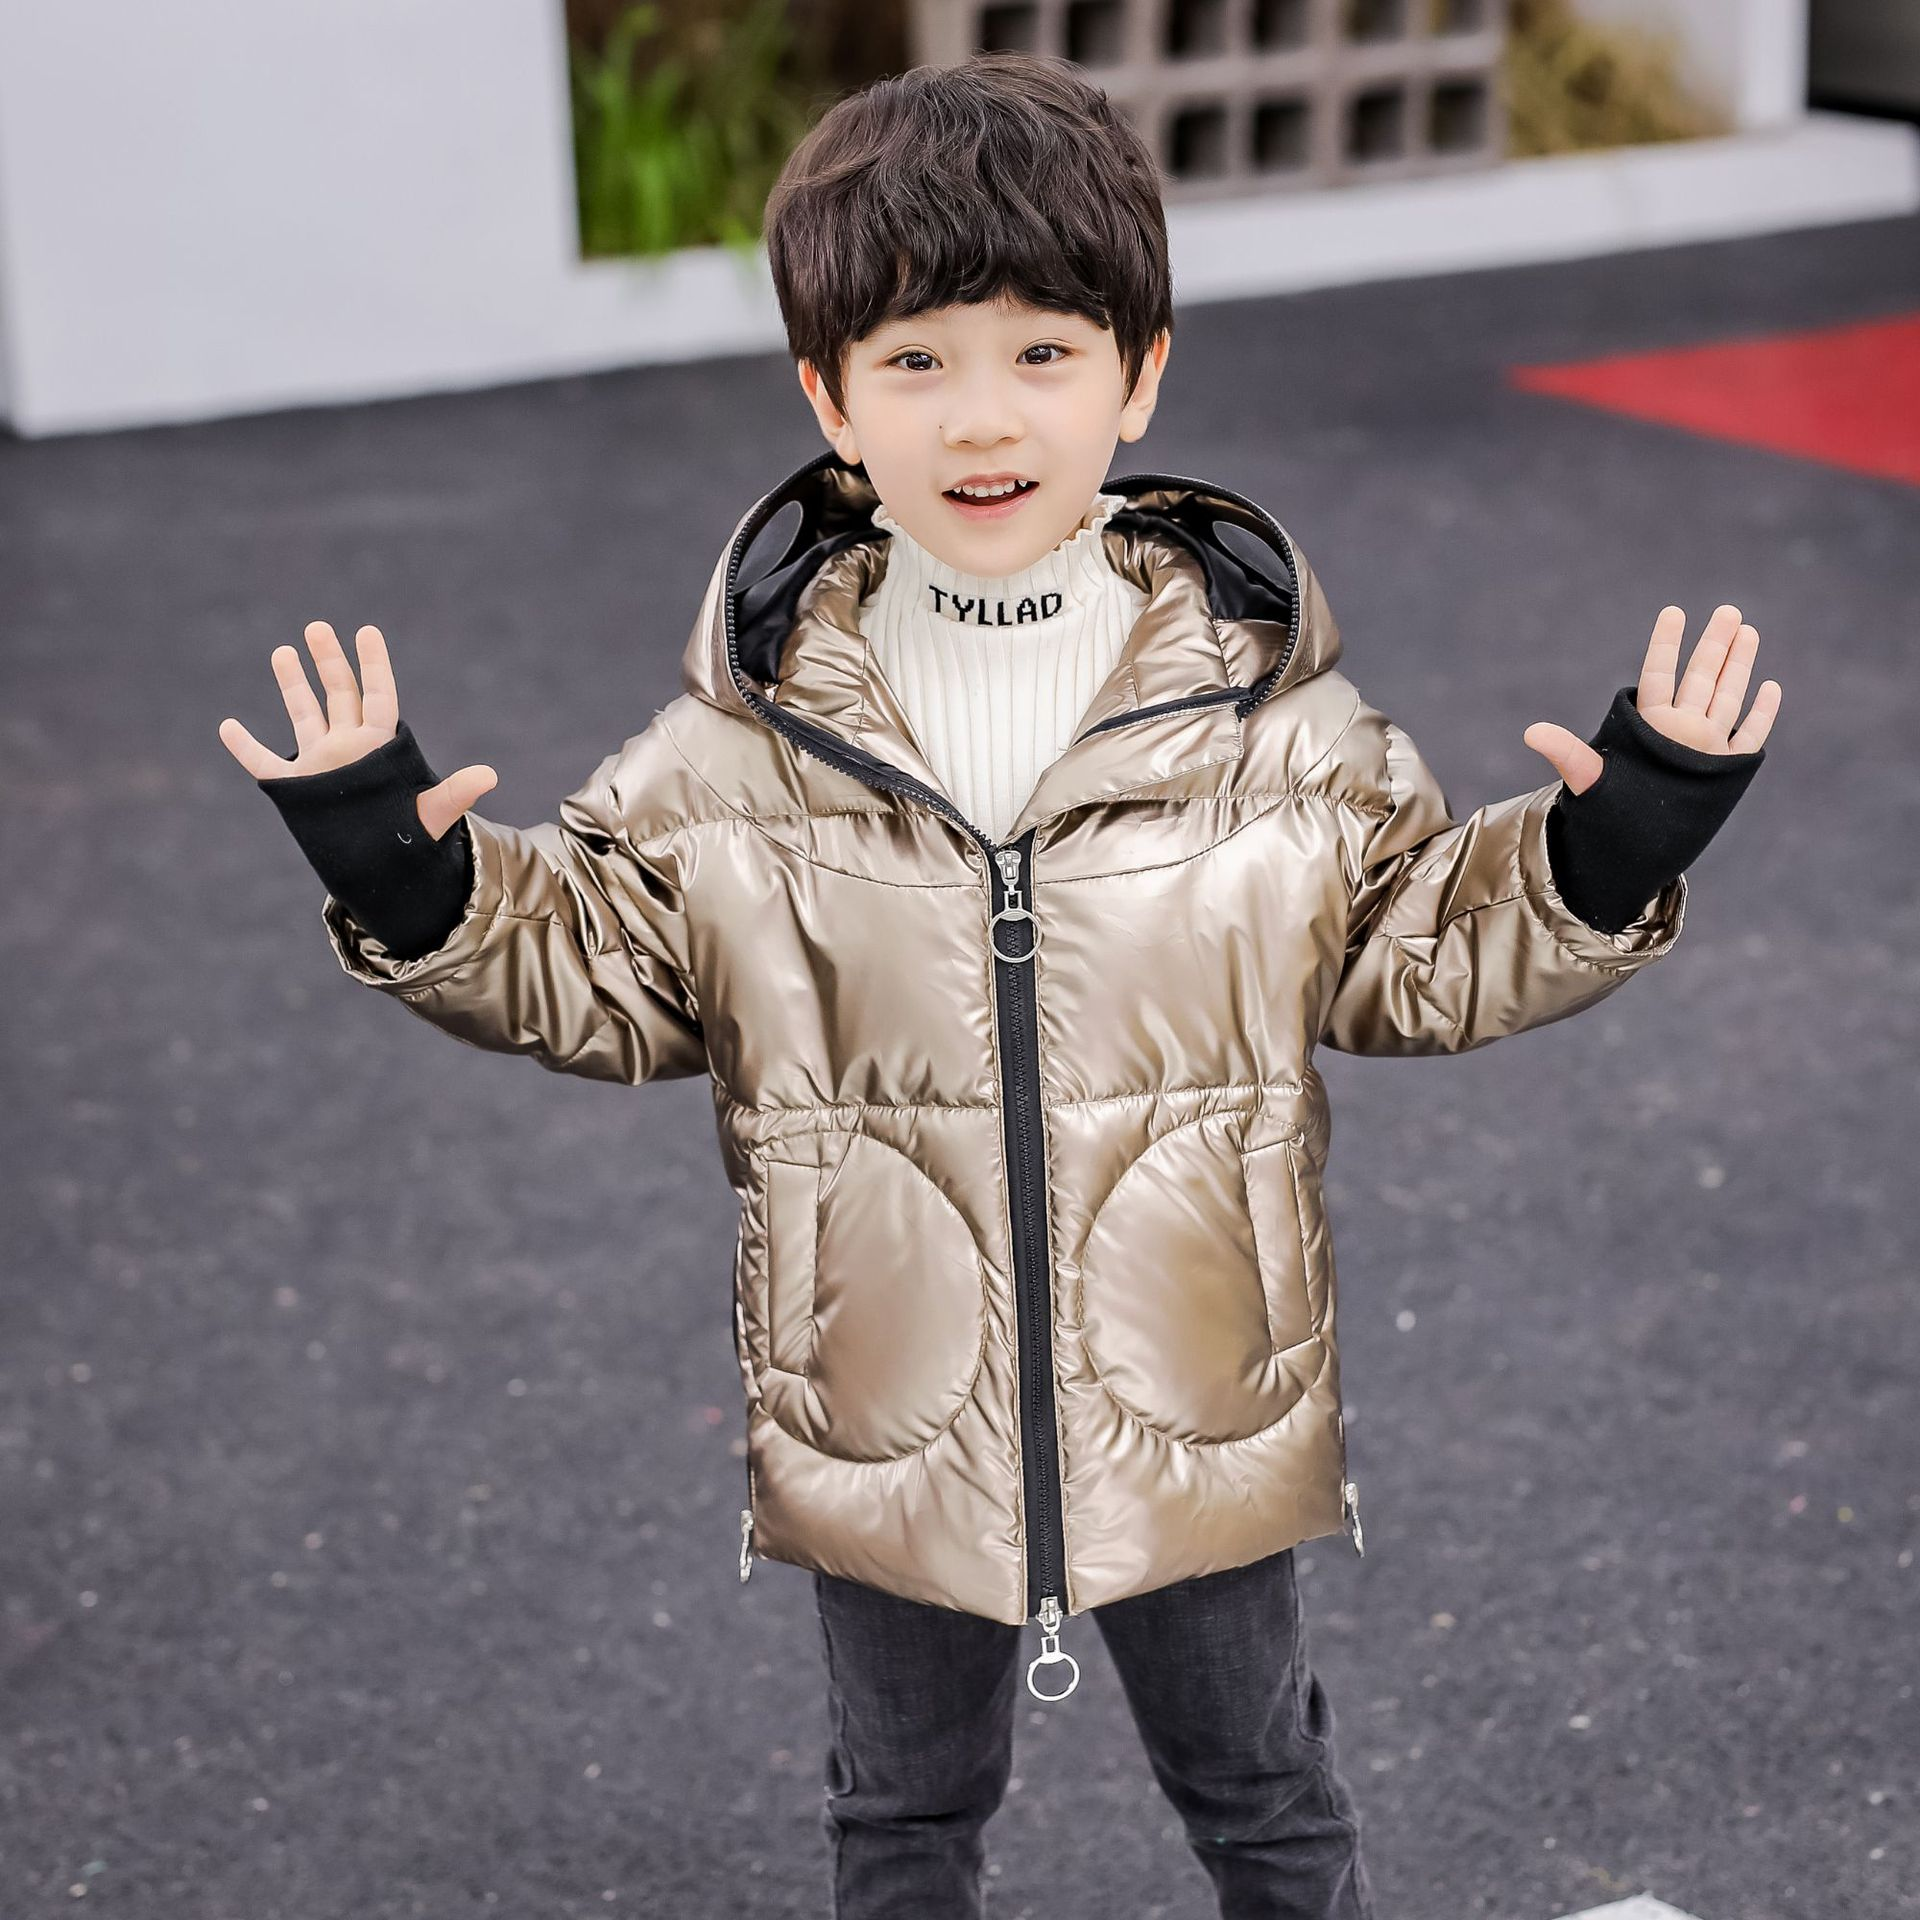 2019 Children's Winter Jacket Altman Down Parka For Boys Long Coats 90% Duck Down Girls Jackets Silver Gold Kids Snow Wear TZ152